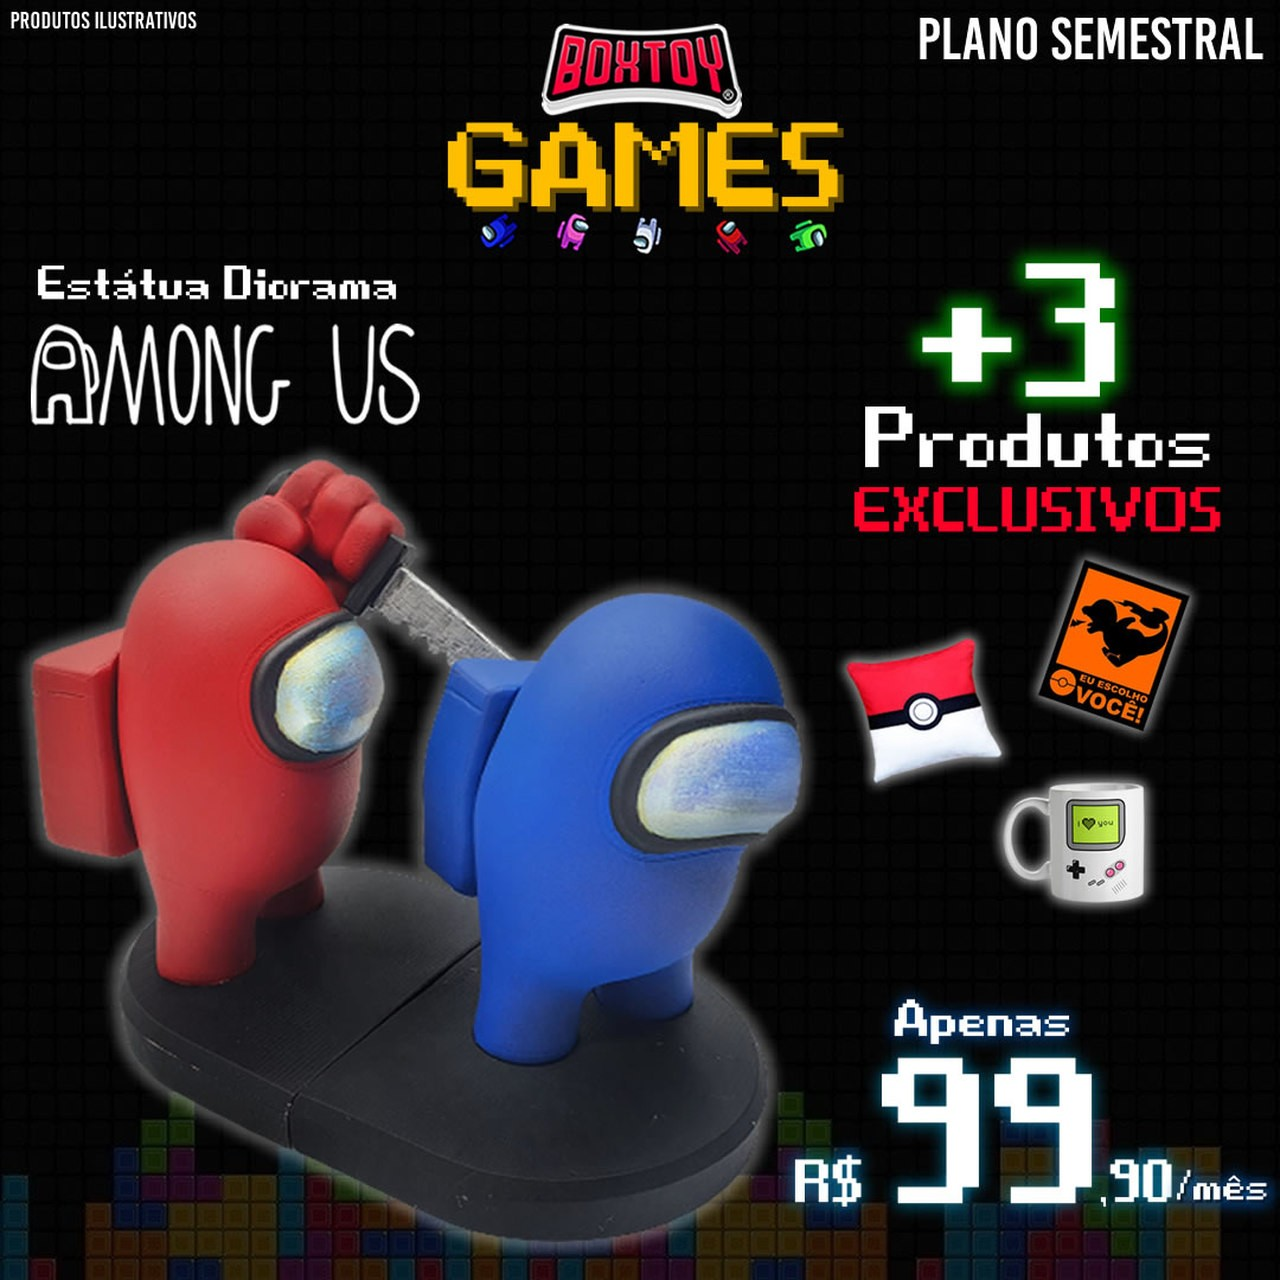 Boxtoy Edição Games - Semestral  - Boxtoy